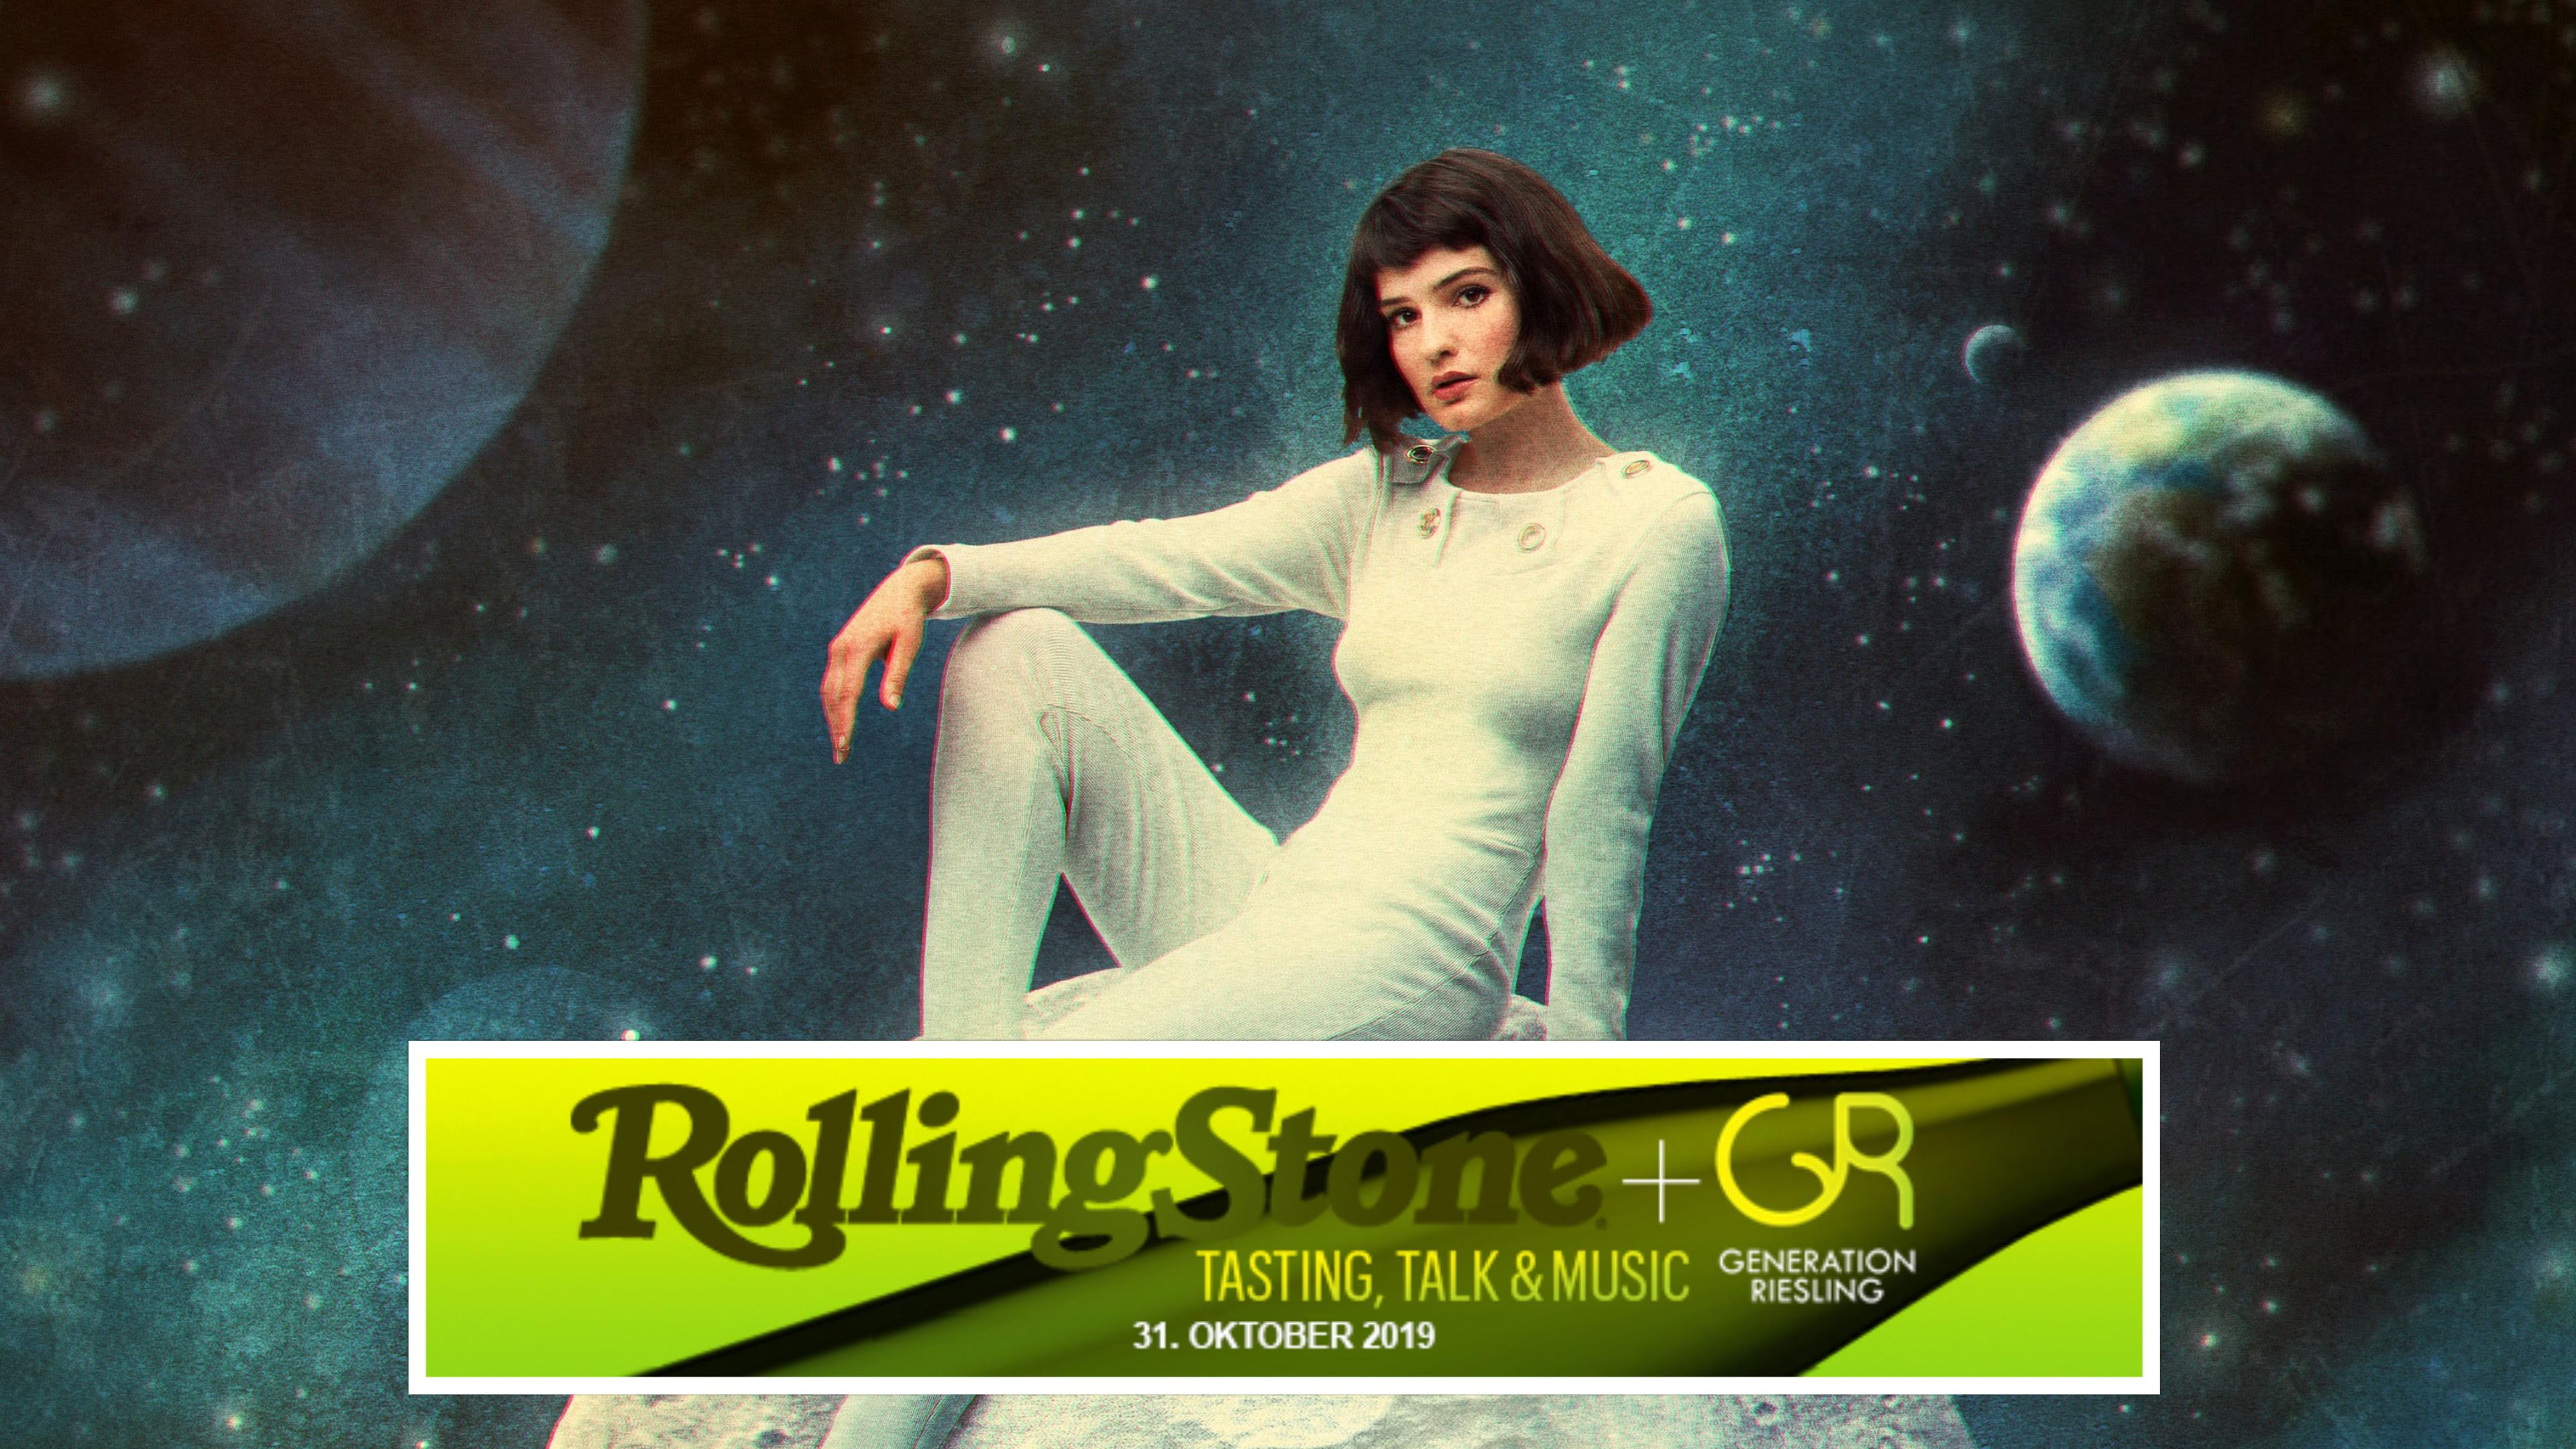 ROLLING STONE & Generation Riesling Tasting, Talk & Music im Venue...